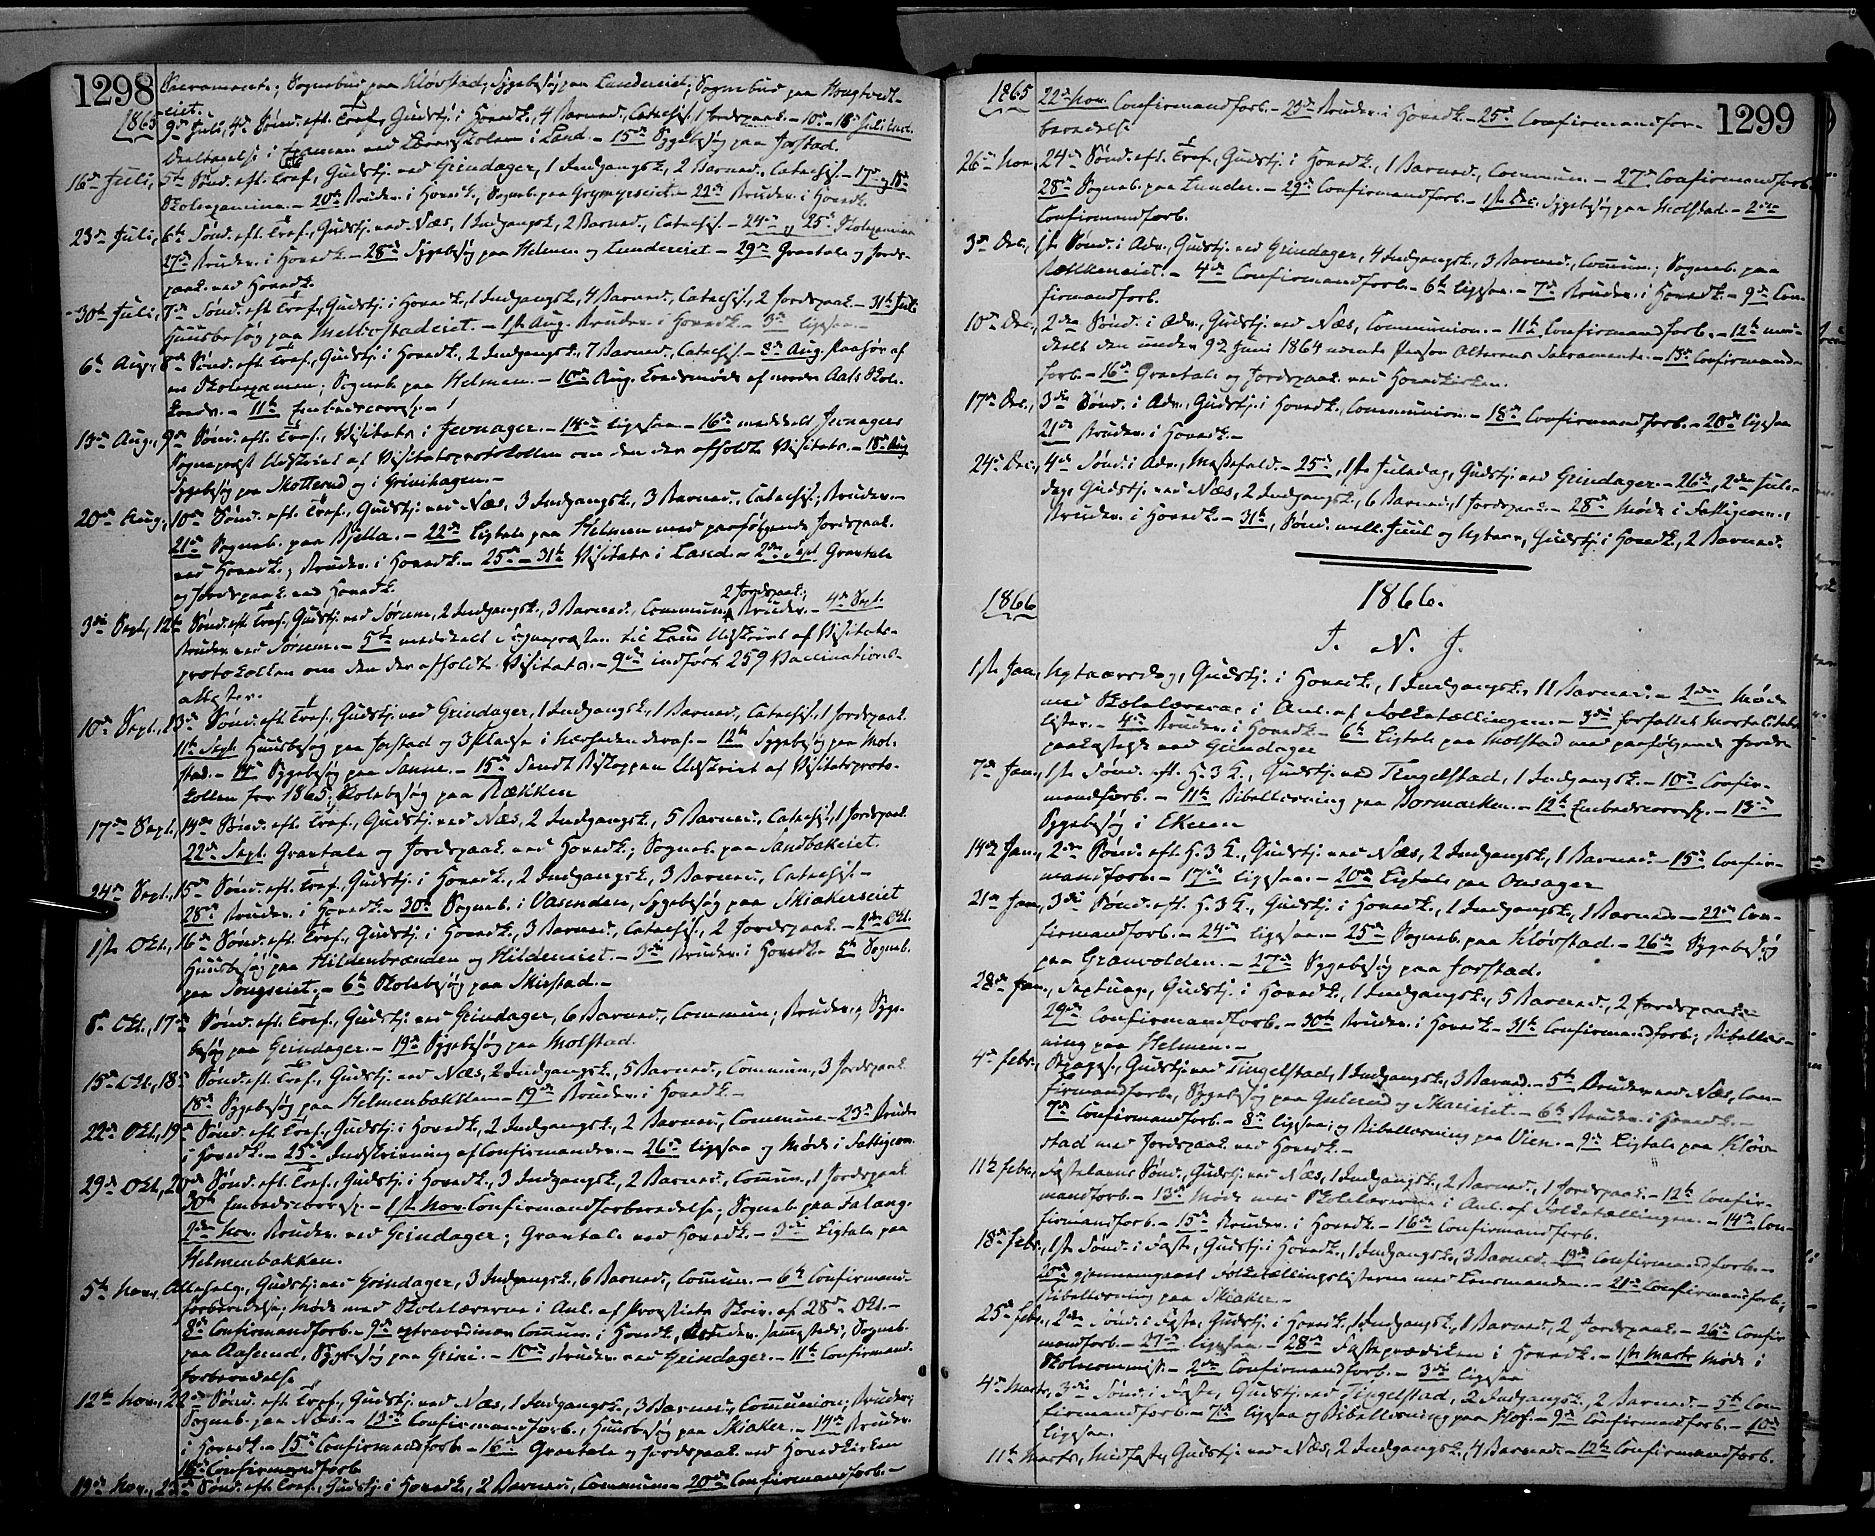 SAH, Gran prestekontor, Ministerialbok nr. 12, 1856-1874, s. 1298-1299